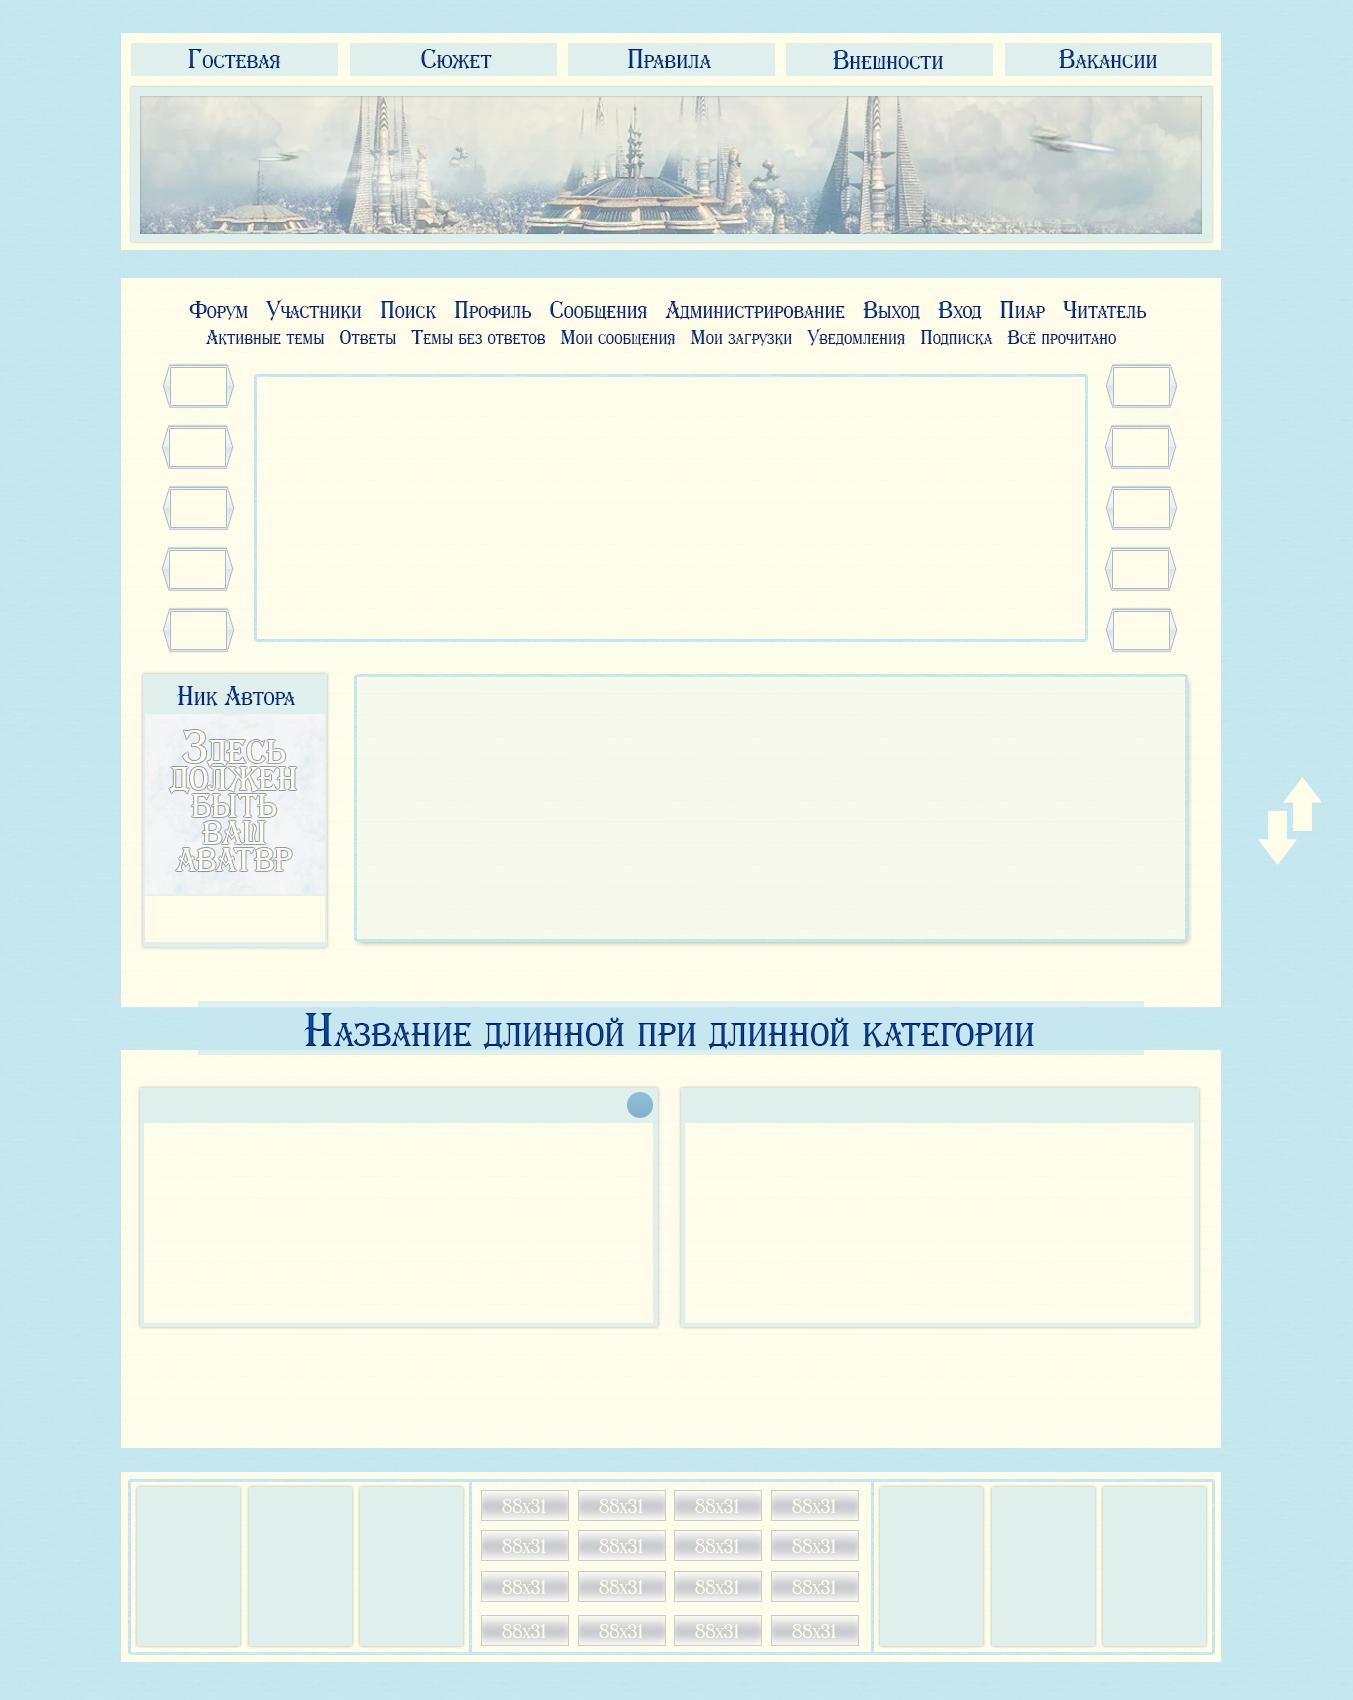 http://forumstatic.ru/files/0019/44/1c/44899.png